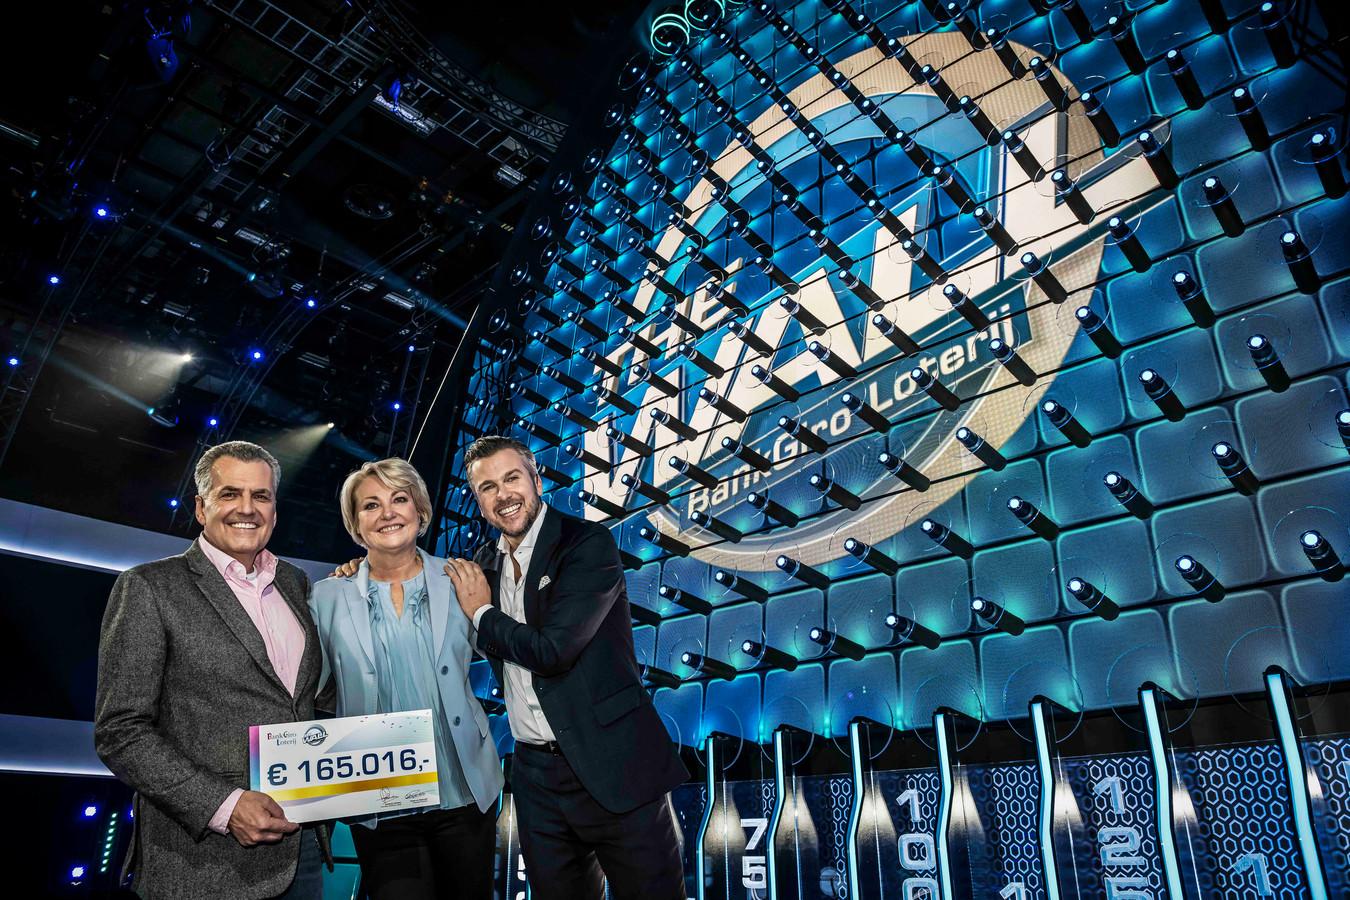 Myriam en Maarten uit Sint-Michielsgestel winnen ruim 165.000 euro in tv-show 'BankGiro Loterij The Wall'.